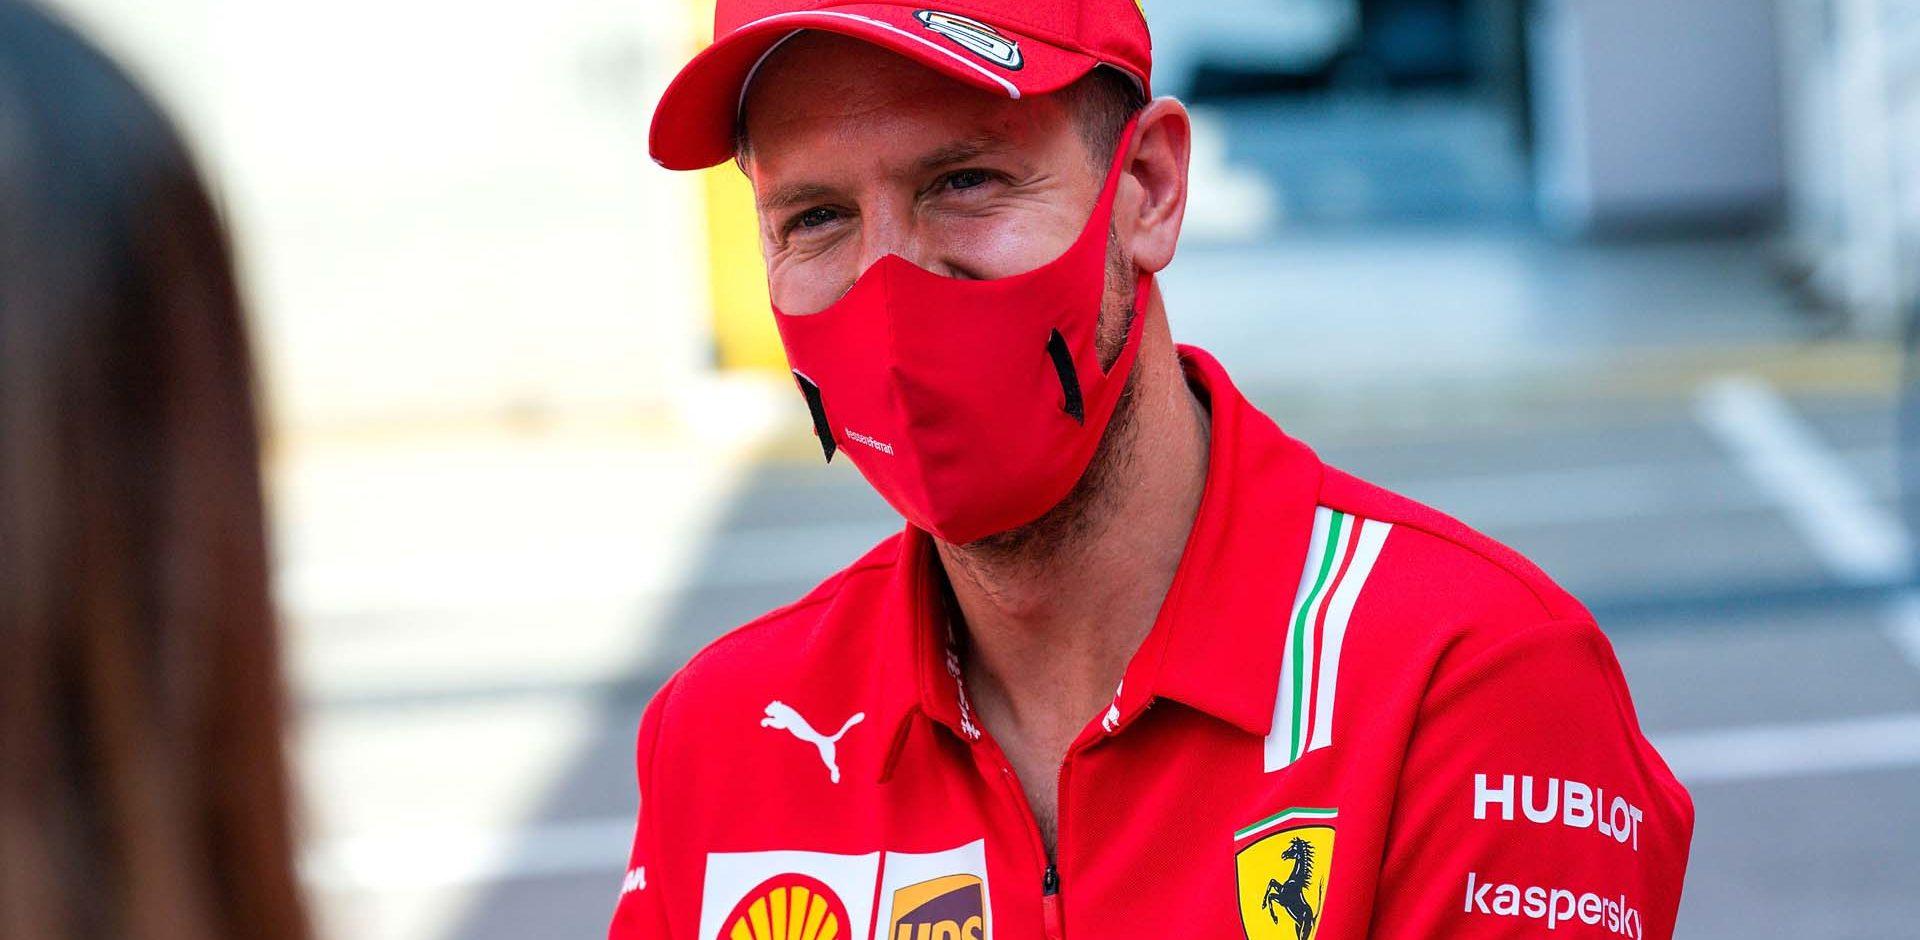 GP SPAGNA F1/2020 -  GIOVEDÌ 13/08/2020  09/08/2020  credit: @Scuderia Ferrari Press Office Sebastian Vettel,